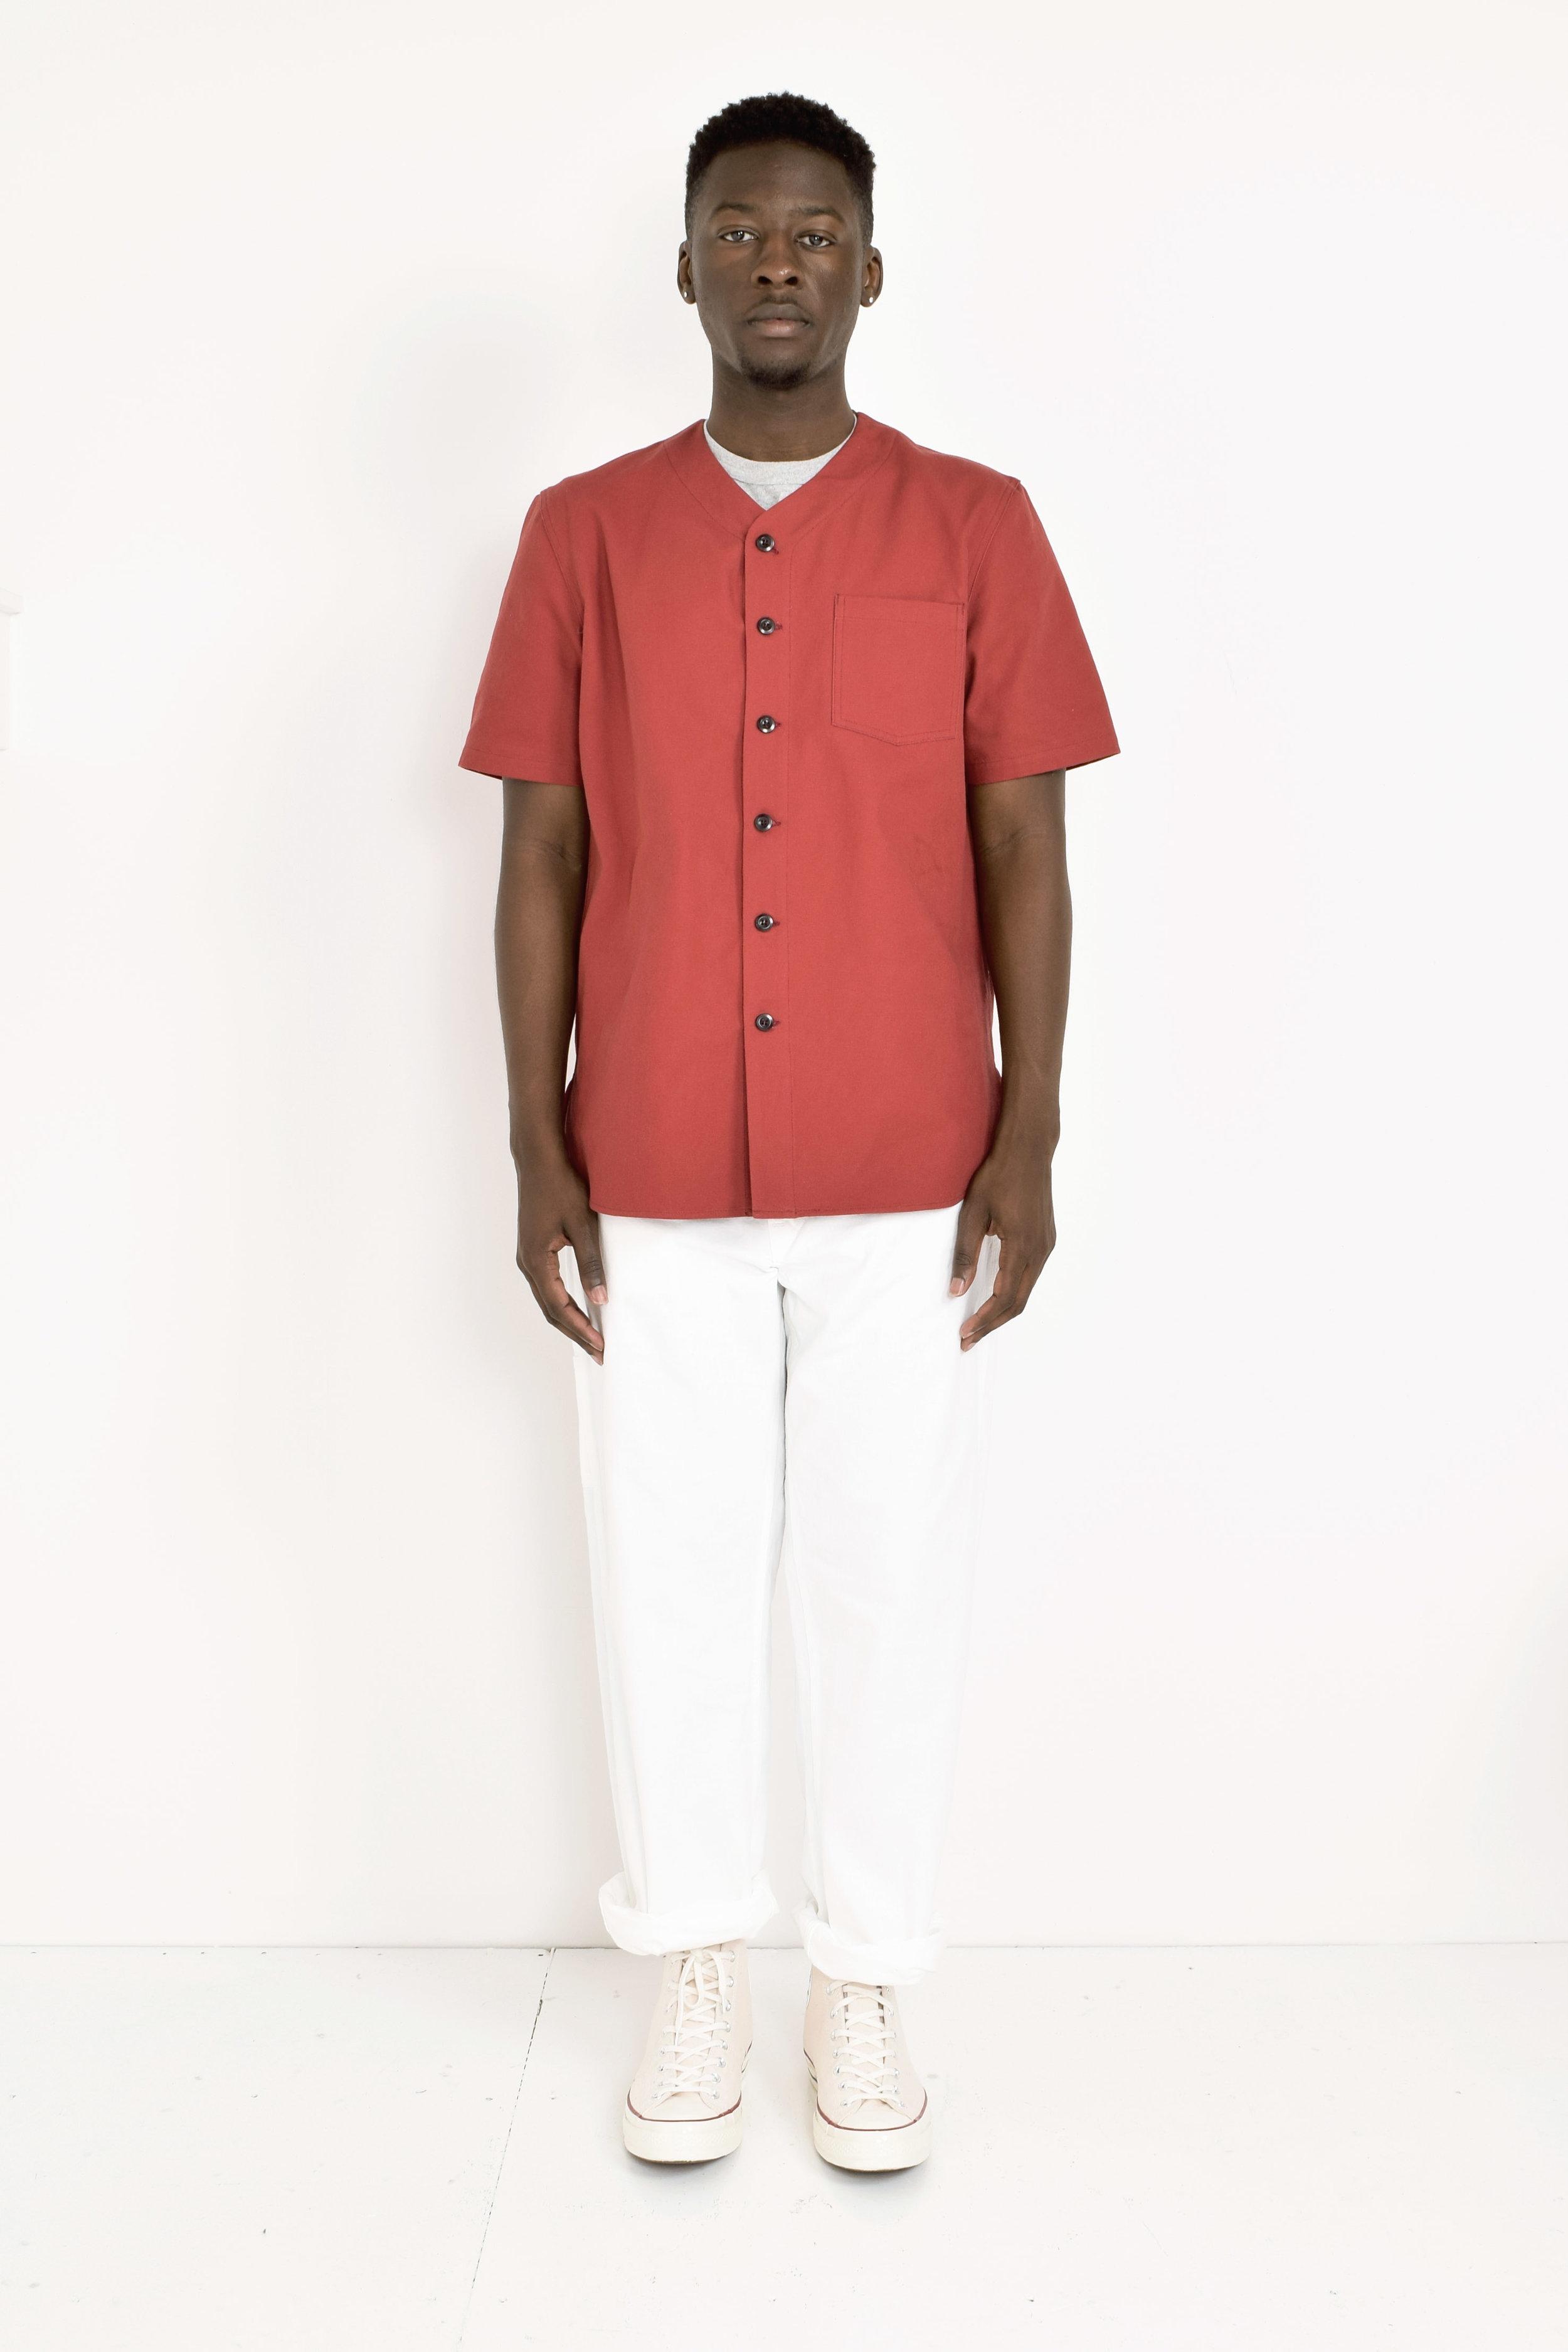 DSC_1188_Batting_Shirt_Red_1.jpg